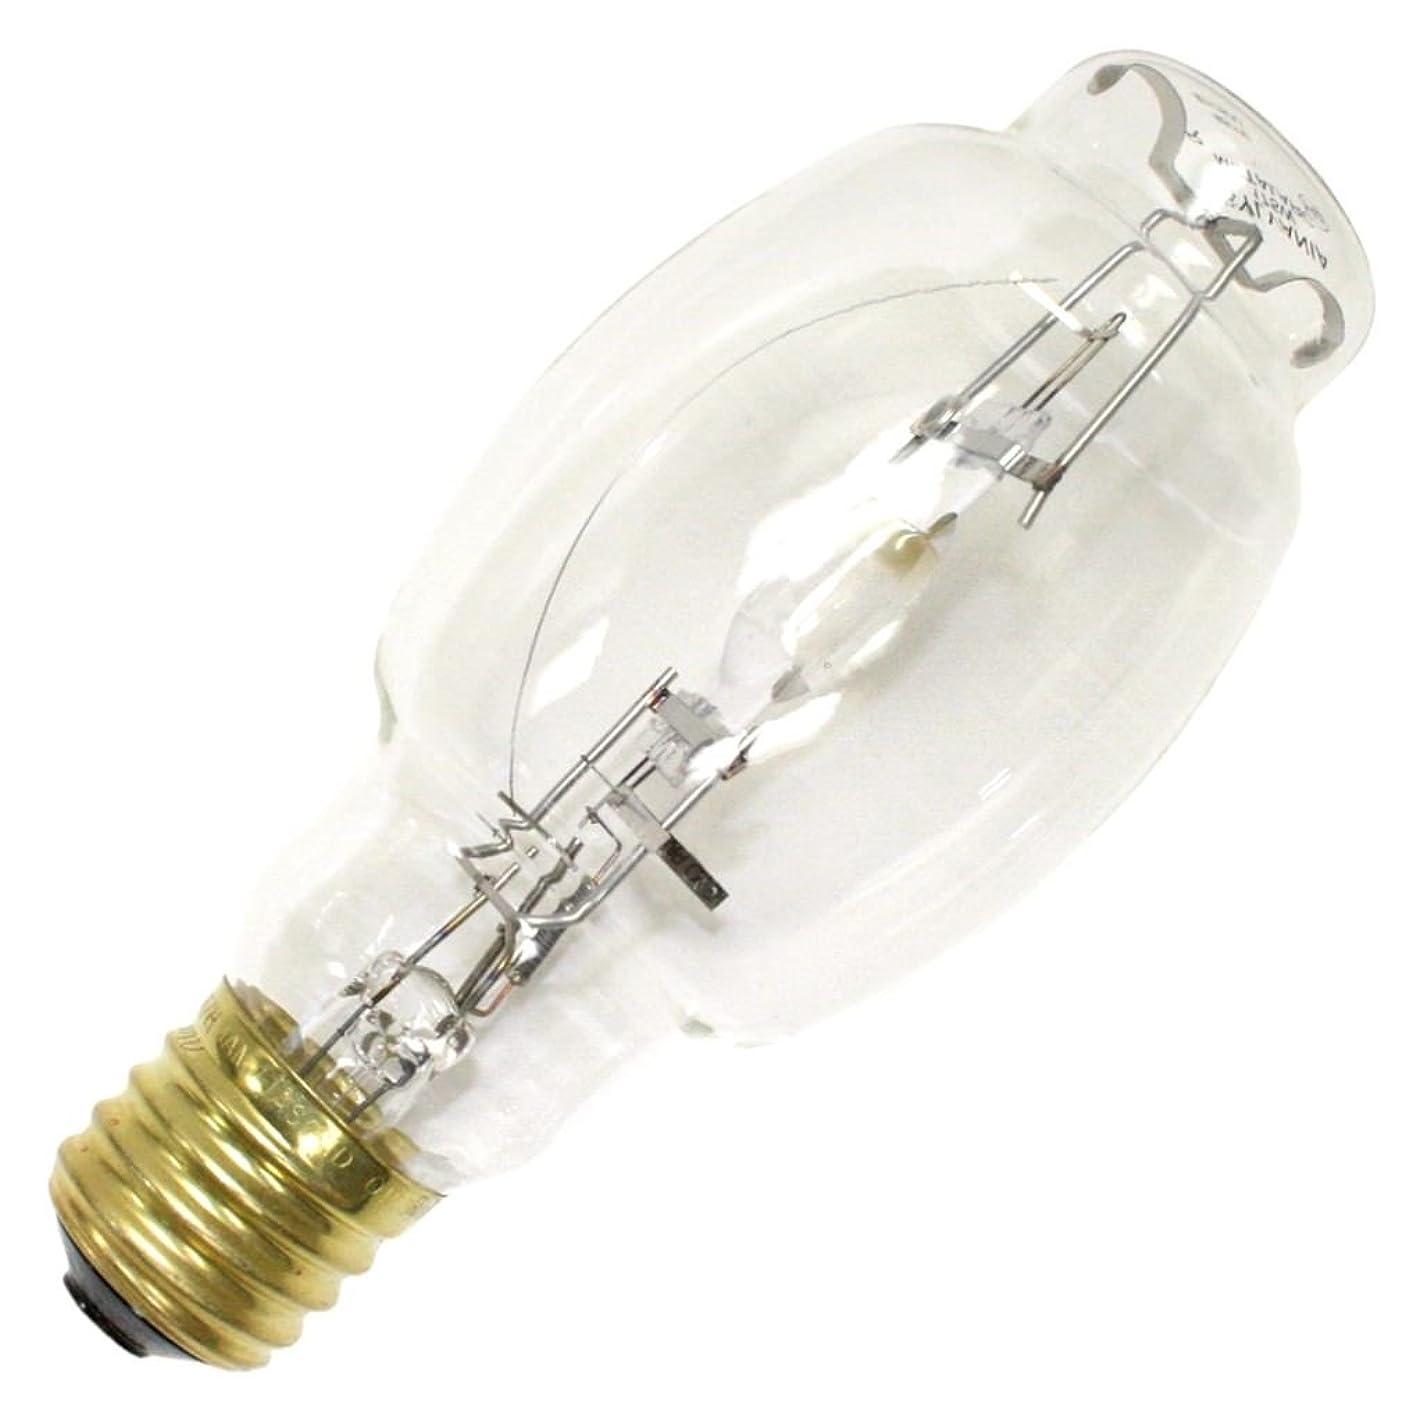 Sylvania 64471 - M175/U 175 watt Metal Halide Light Bulb